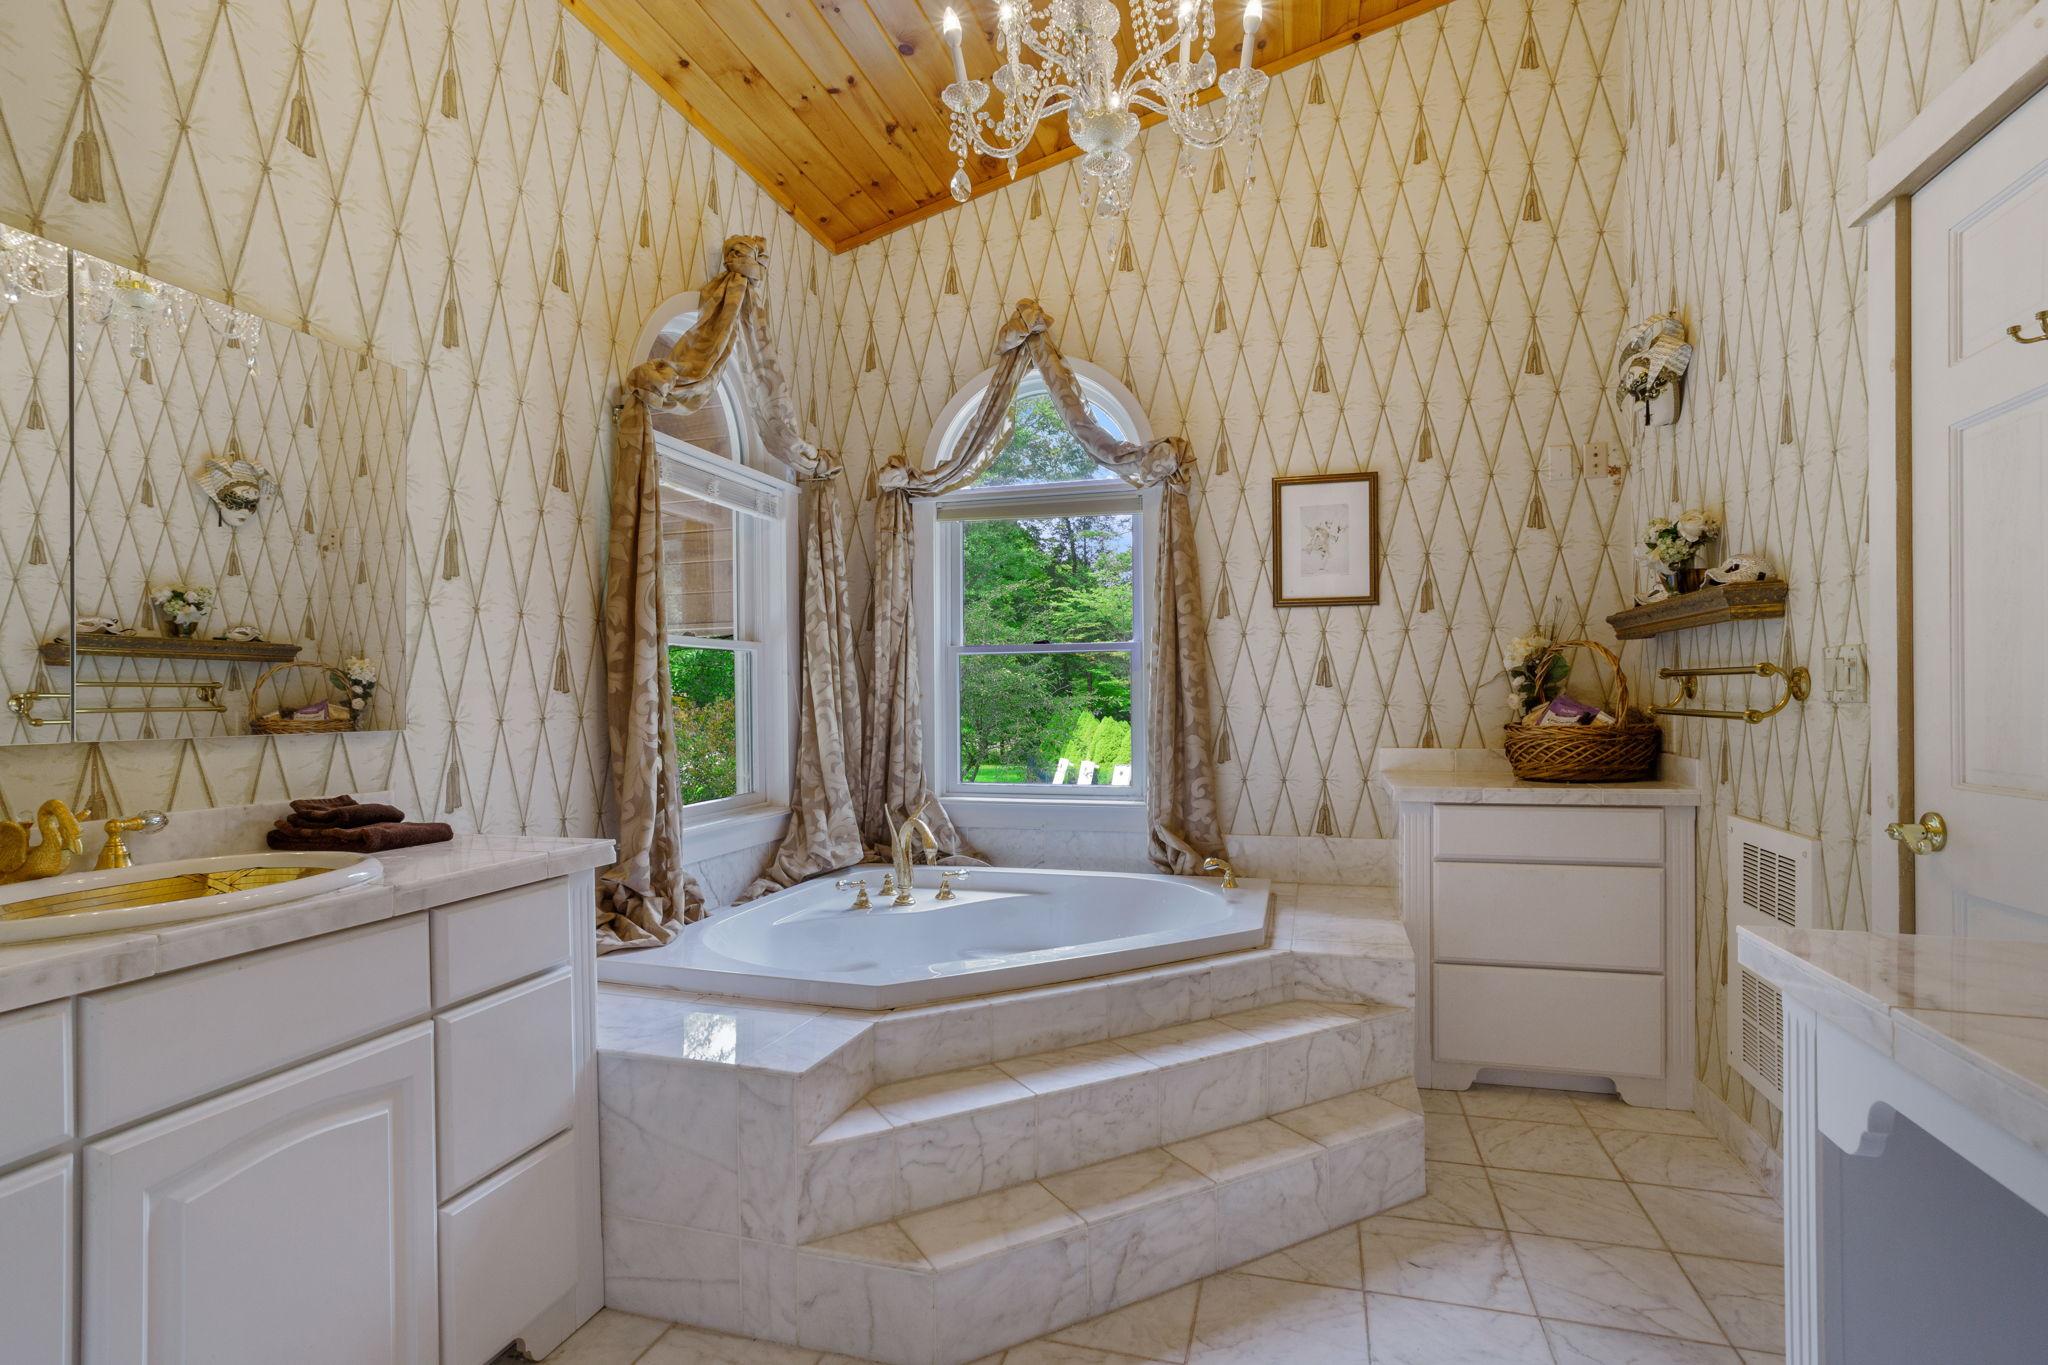 Grand Master's Bathroom